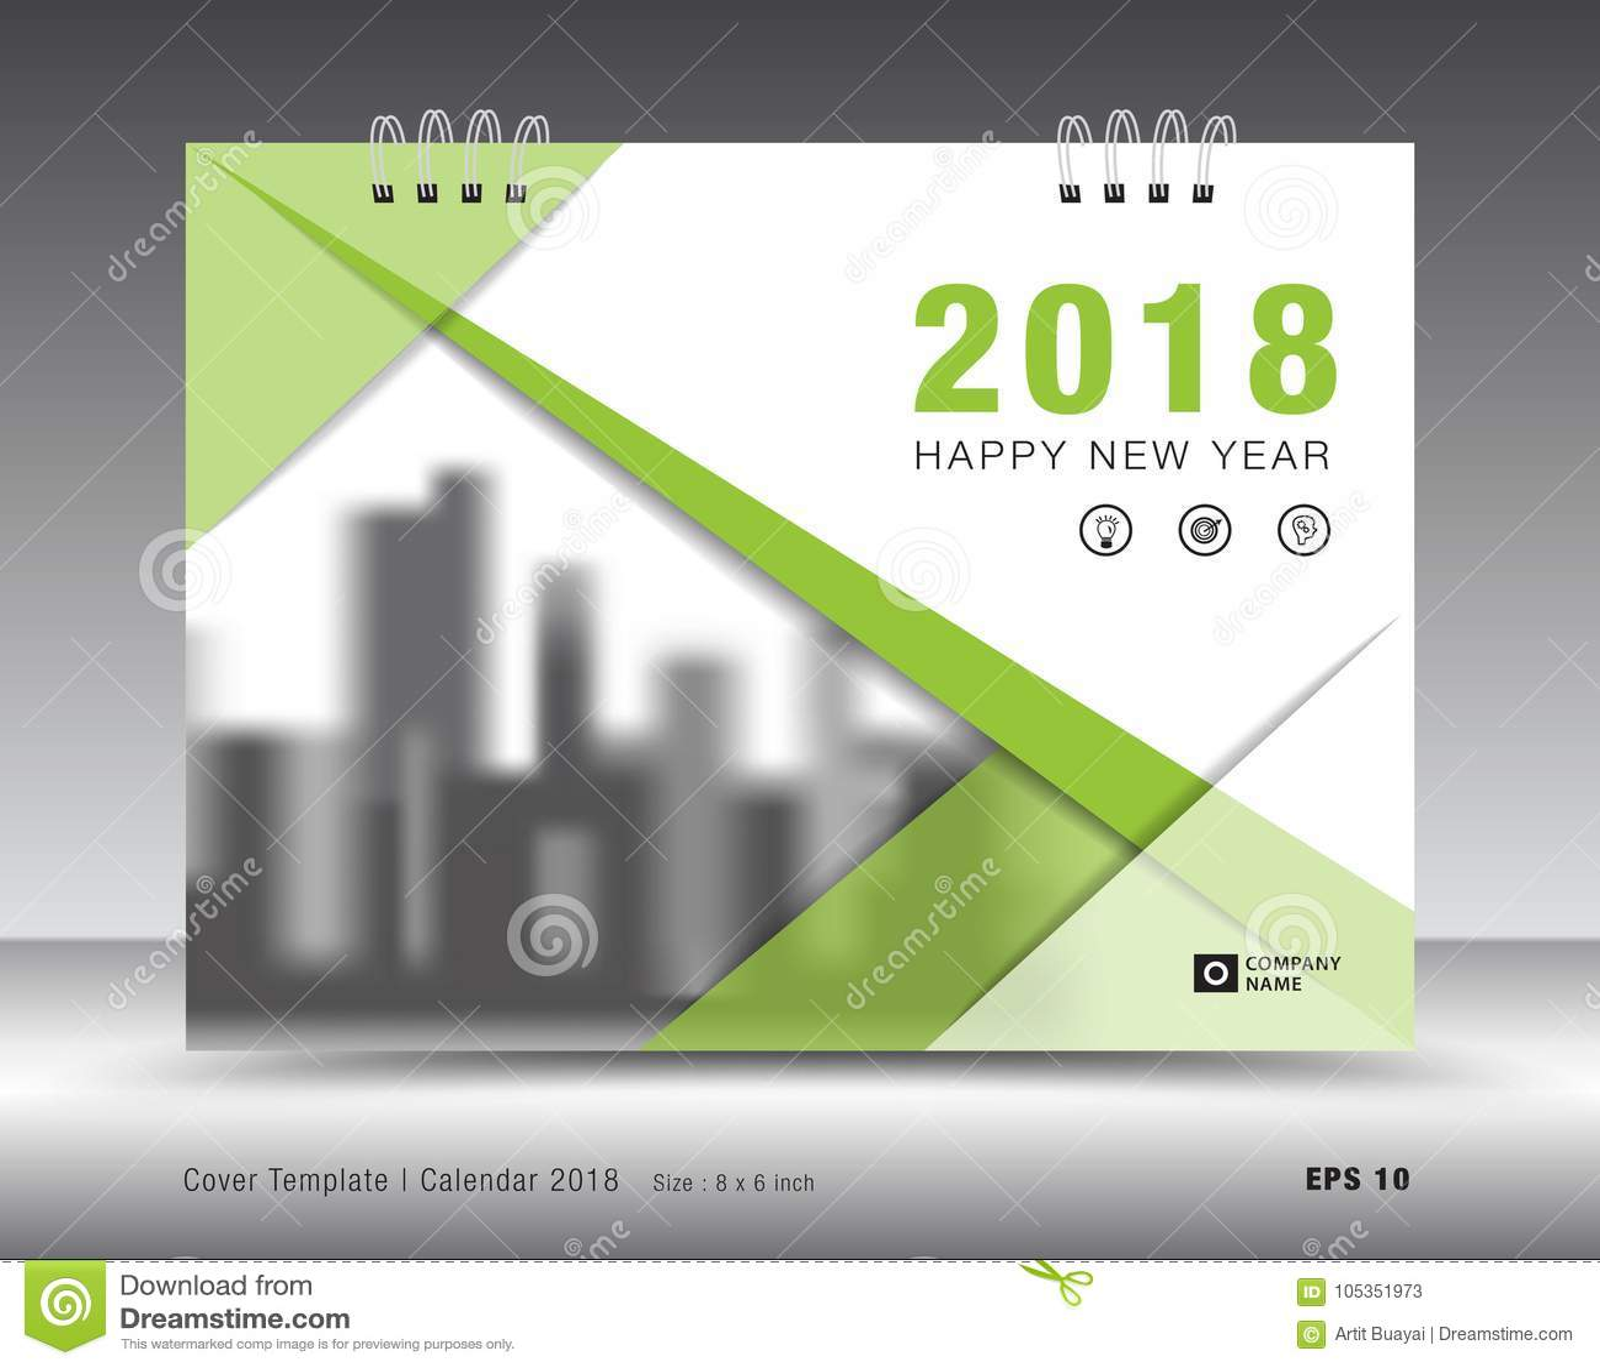 Cover Calendar 2018 Template Green Book Layout Business Brochure